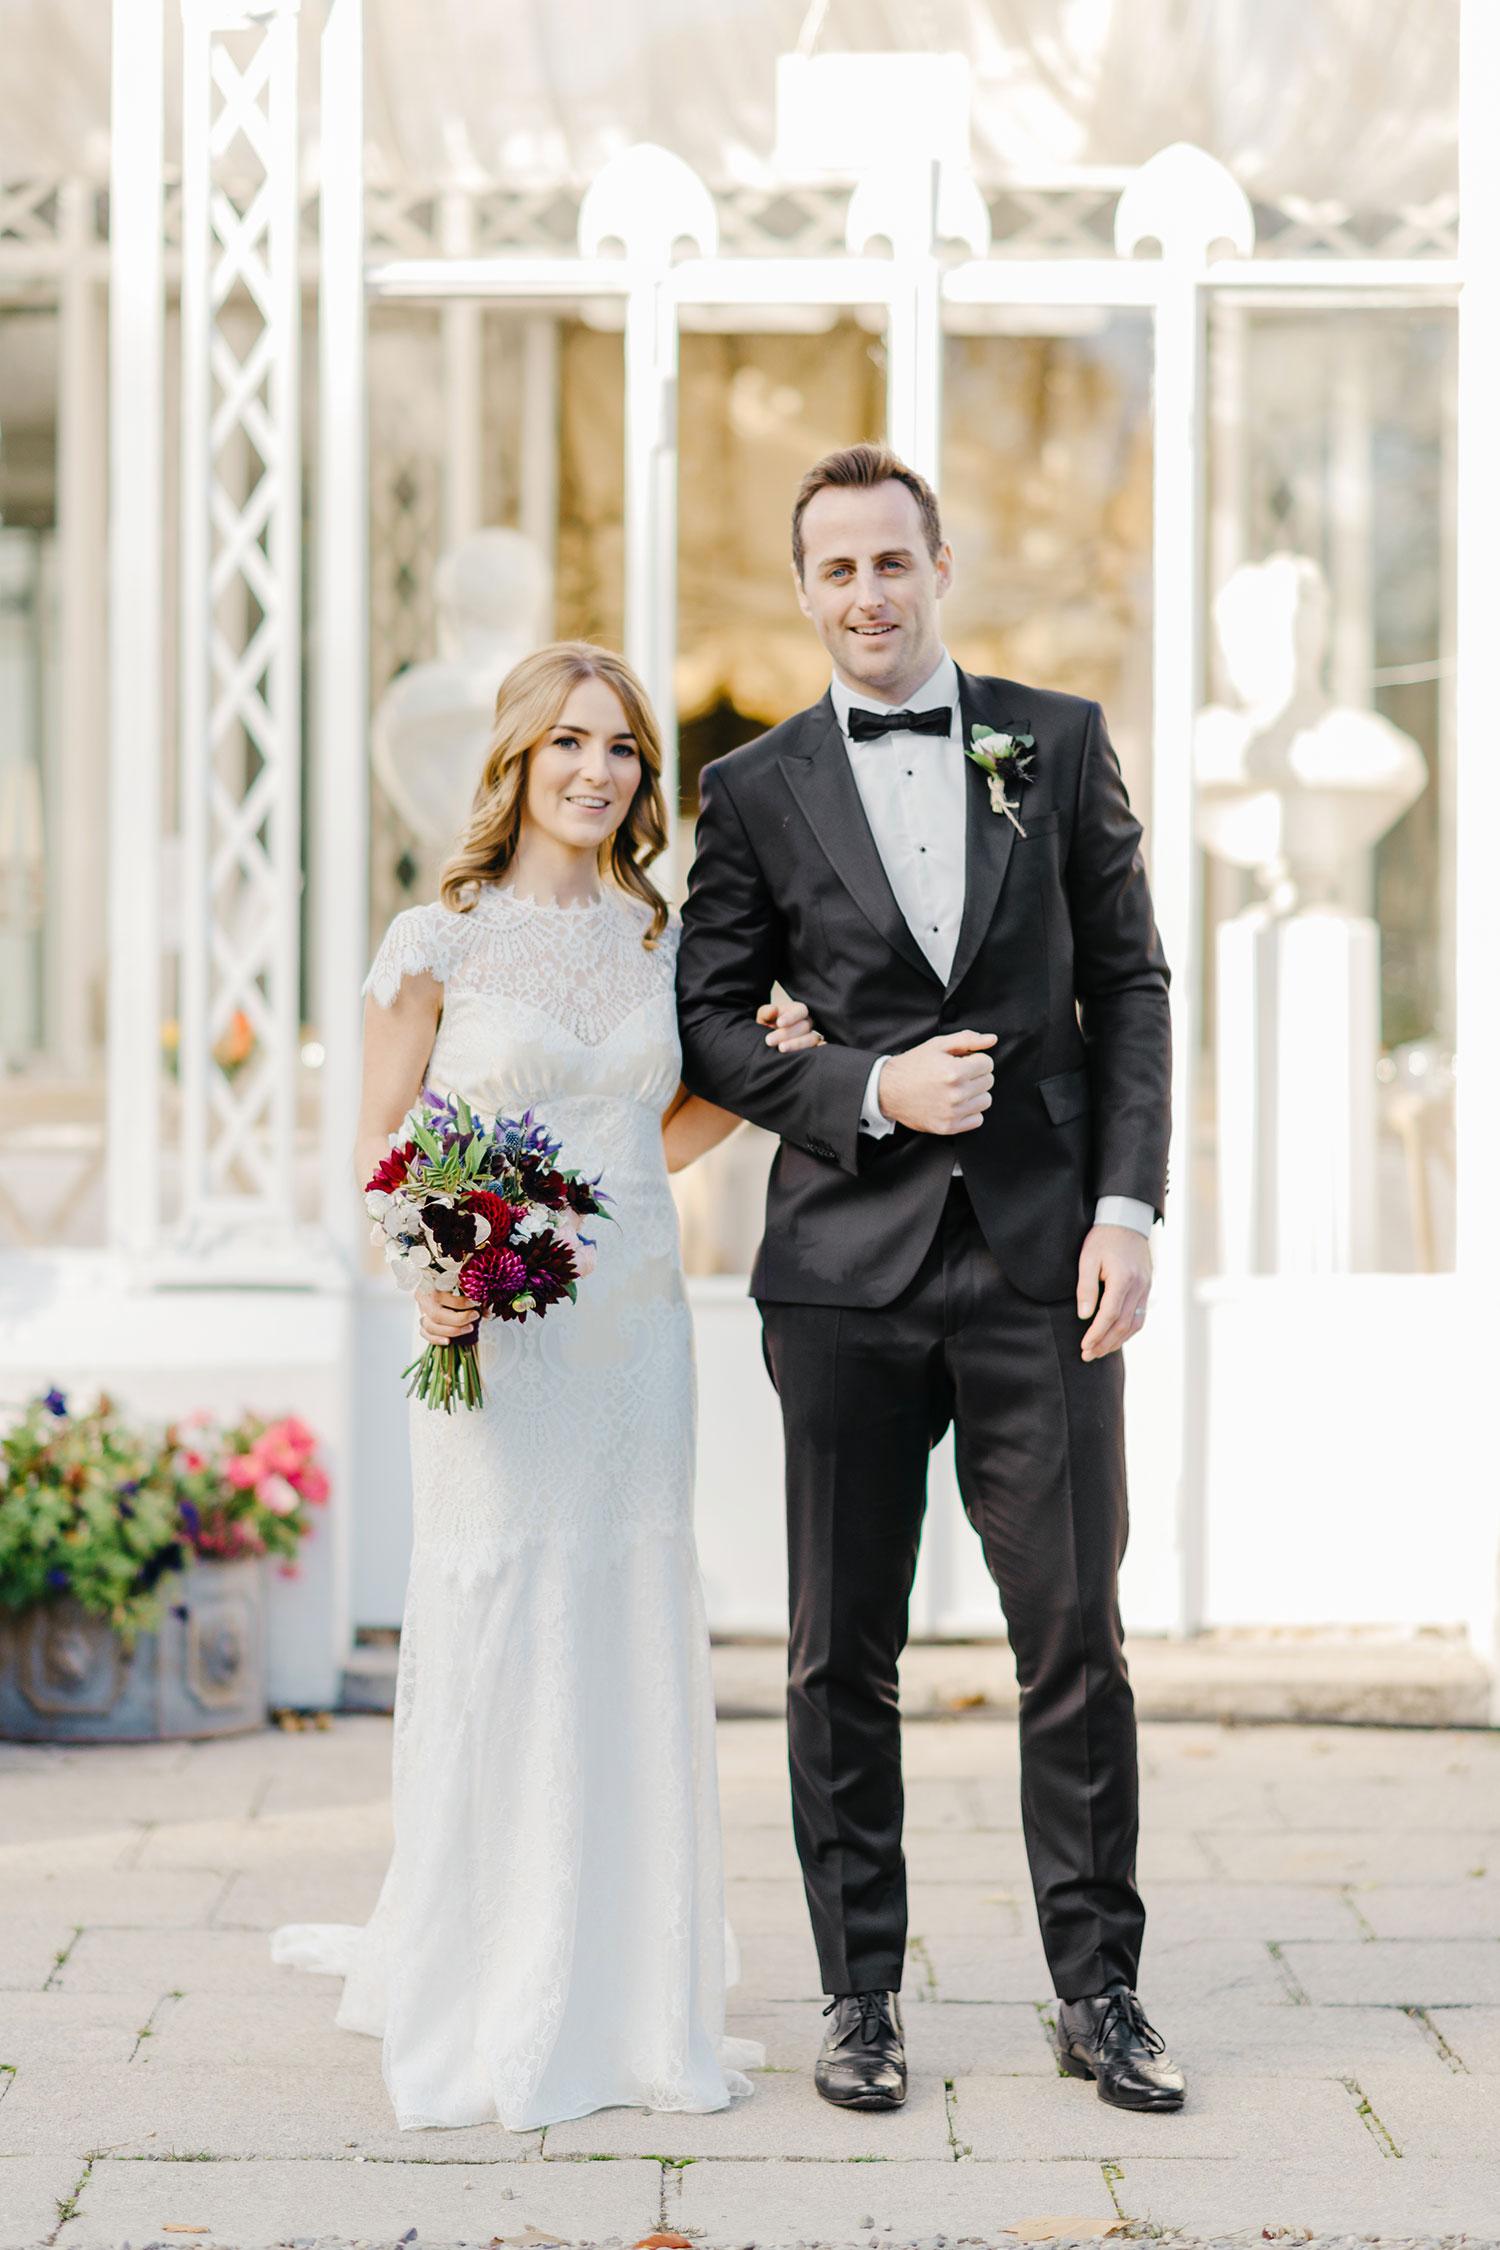 bellinter-house-wedding-photographer-0068_0068.jpg